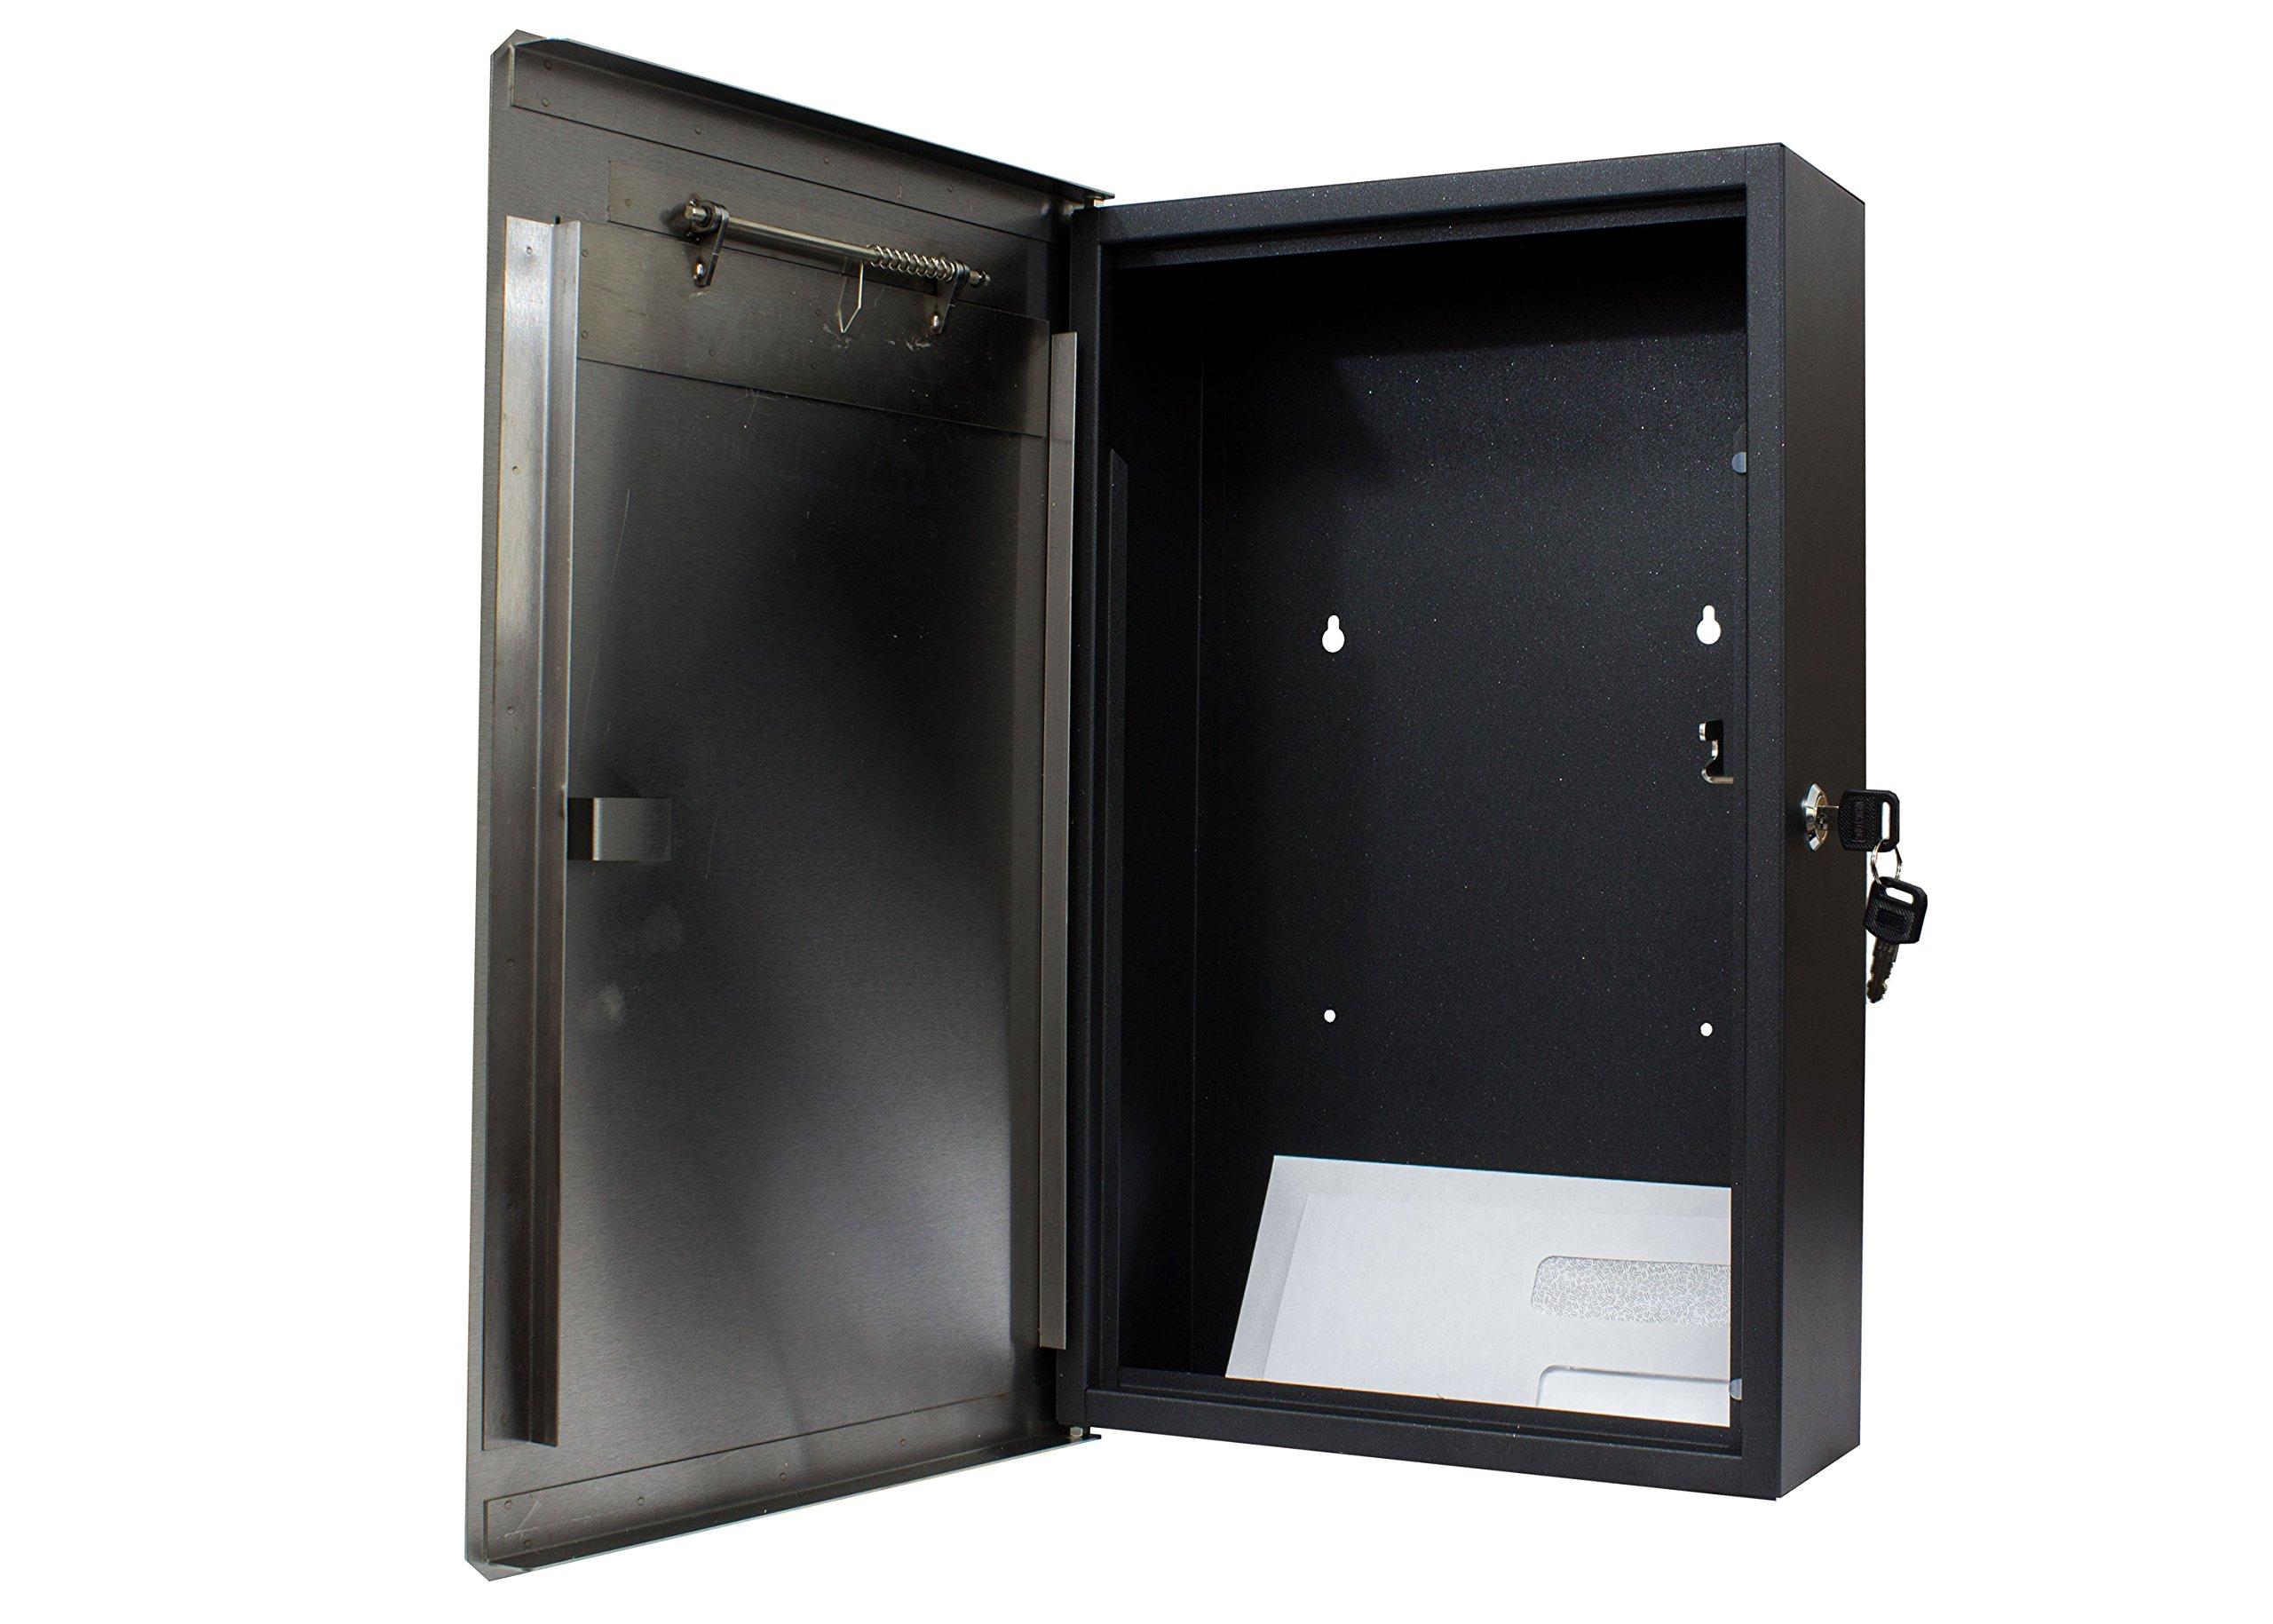 Qualarc WF-PM18 Verse Wall Mount Rectangular Stainless Steel Front Locking Mailbox, Silver/Black by Qualarc (Image #3)